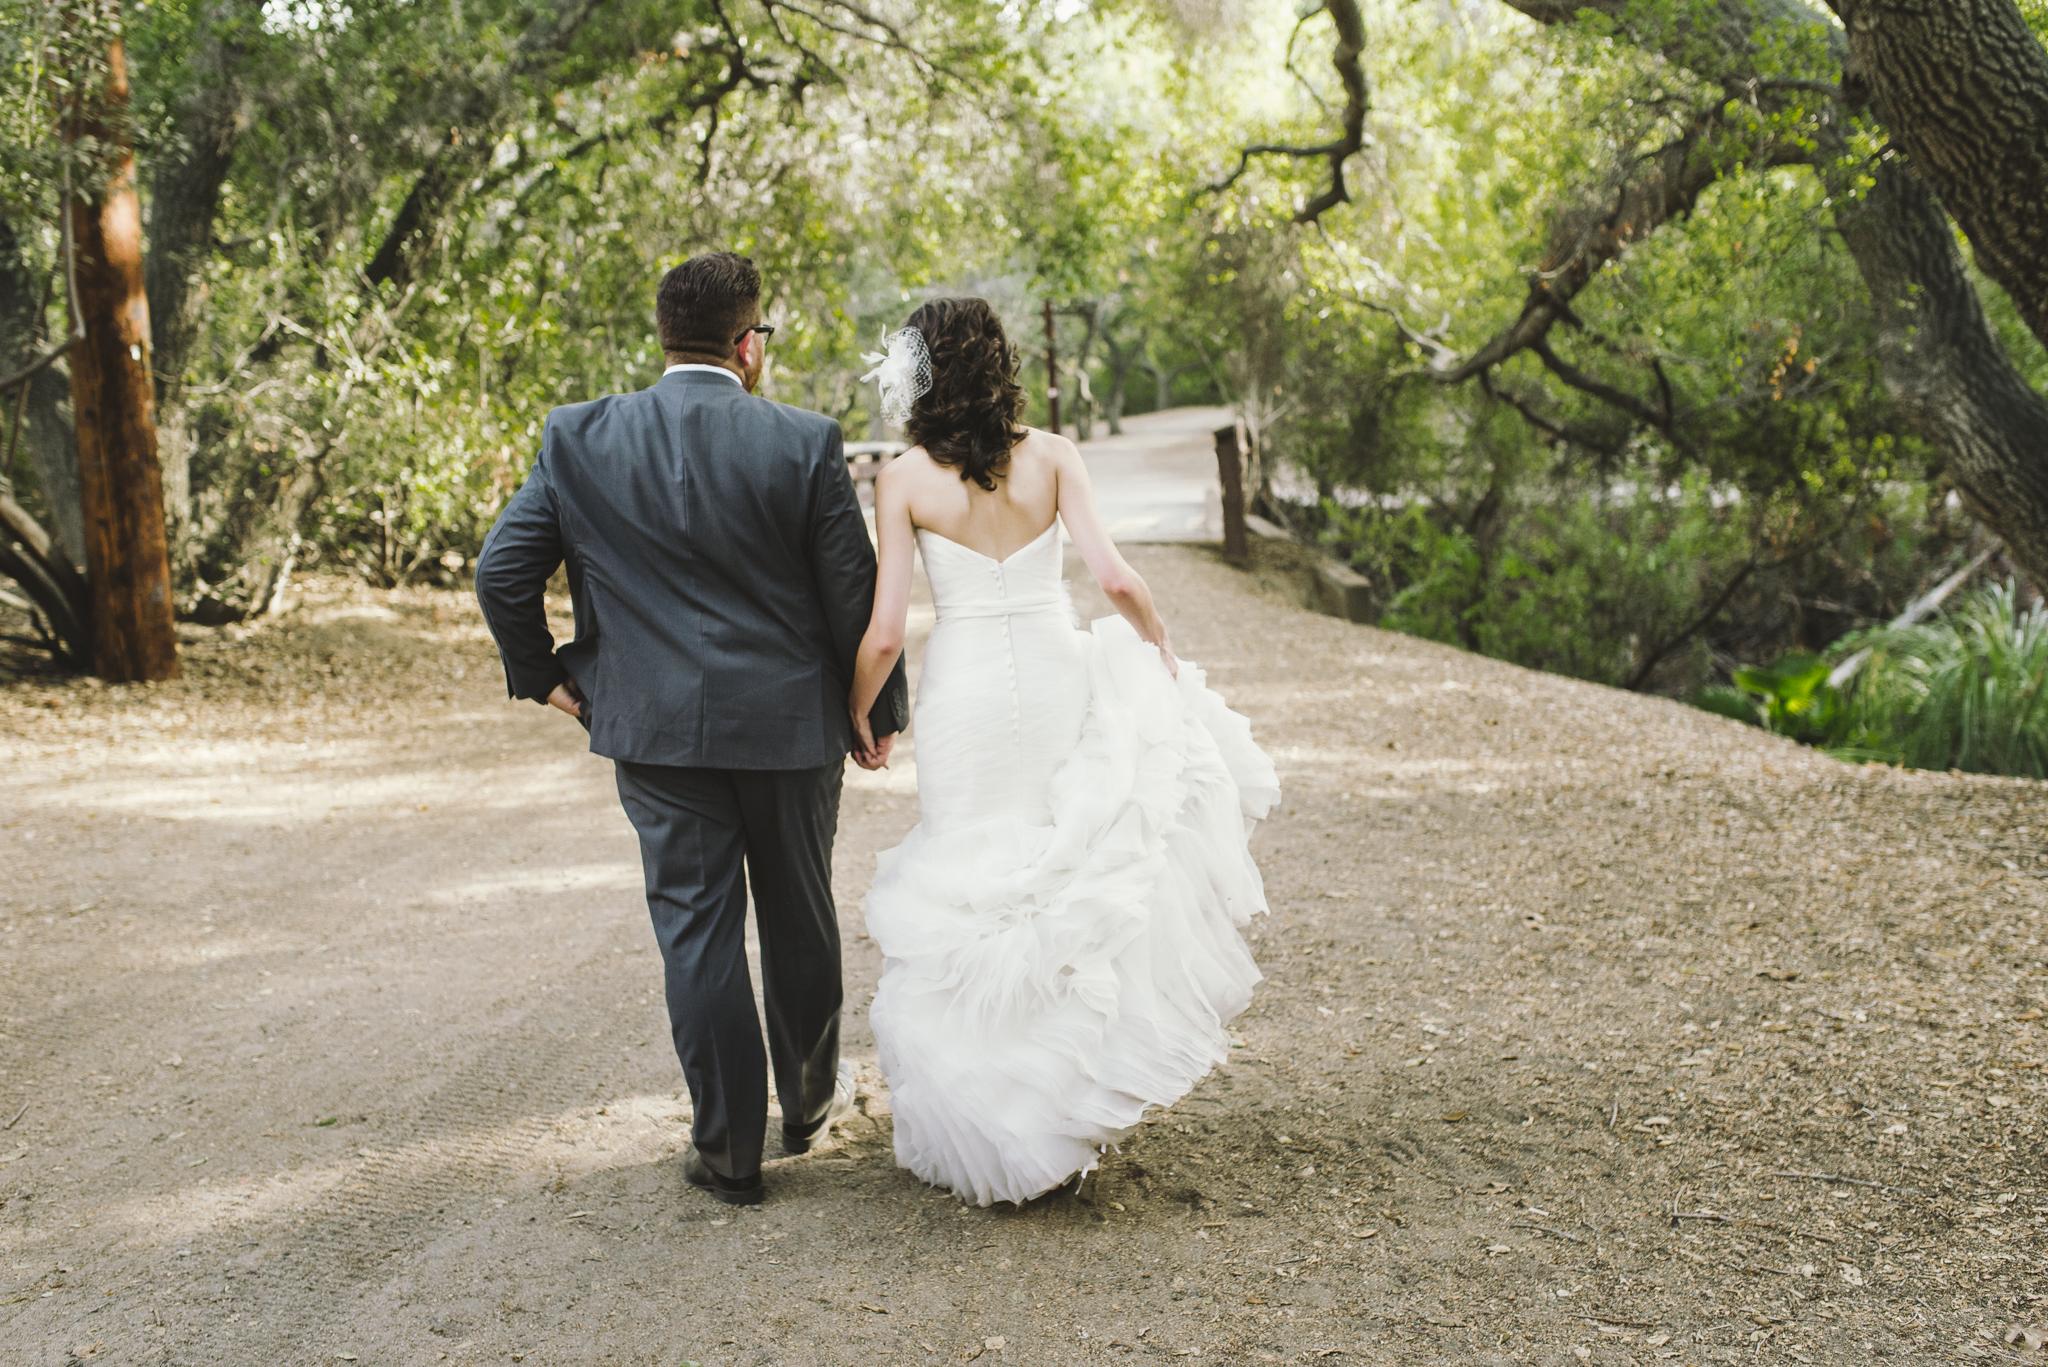 Isaiah & Taylor Photography - Los Angeles Lifestyle Wedding Photographer-20.jpg